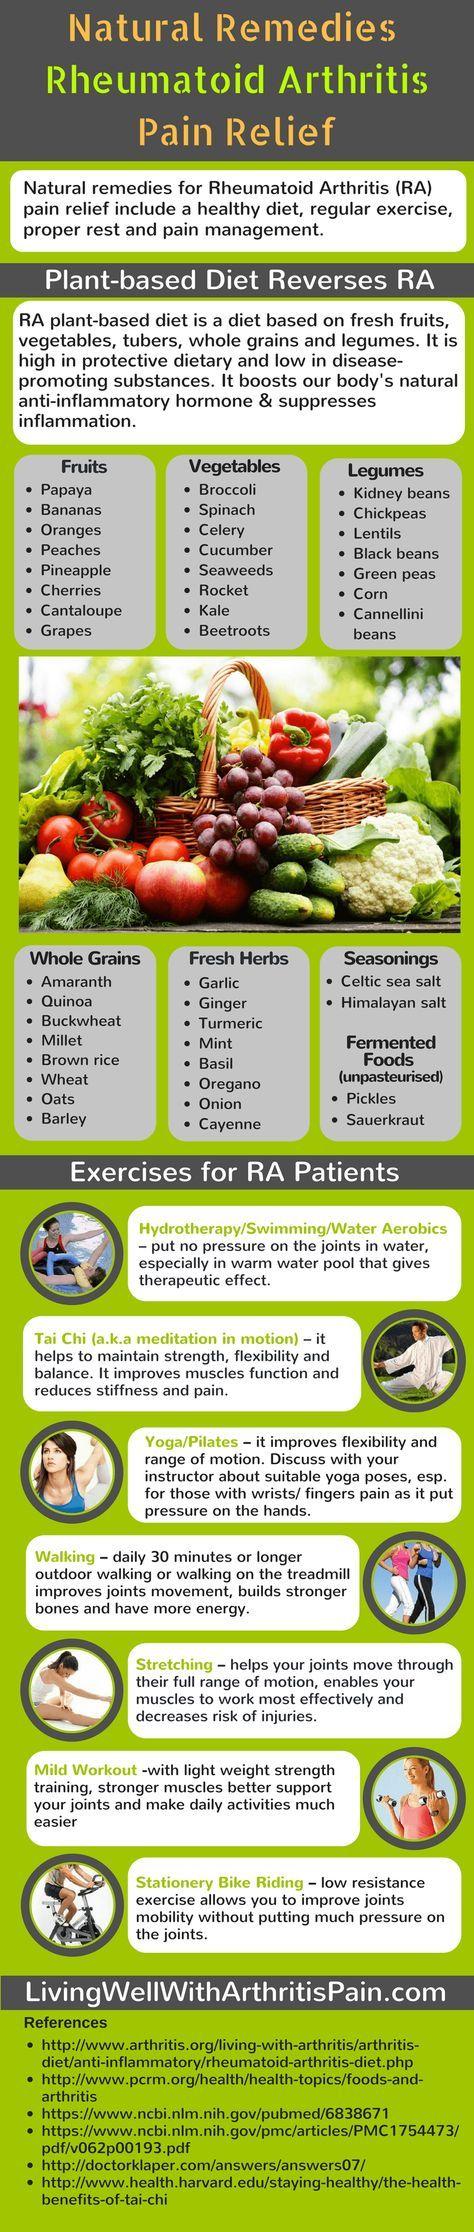 how+to+cure+rheumatoid+arthritis+naturally